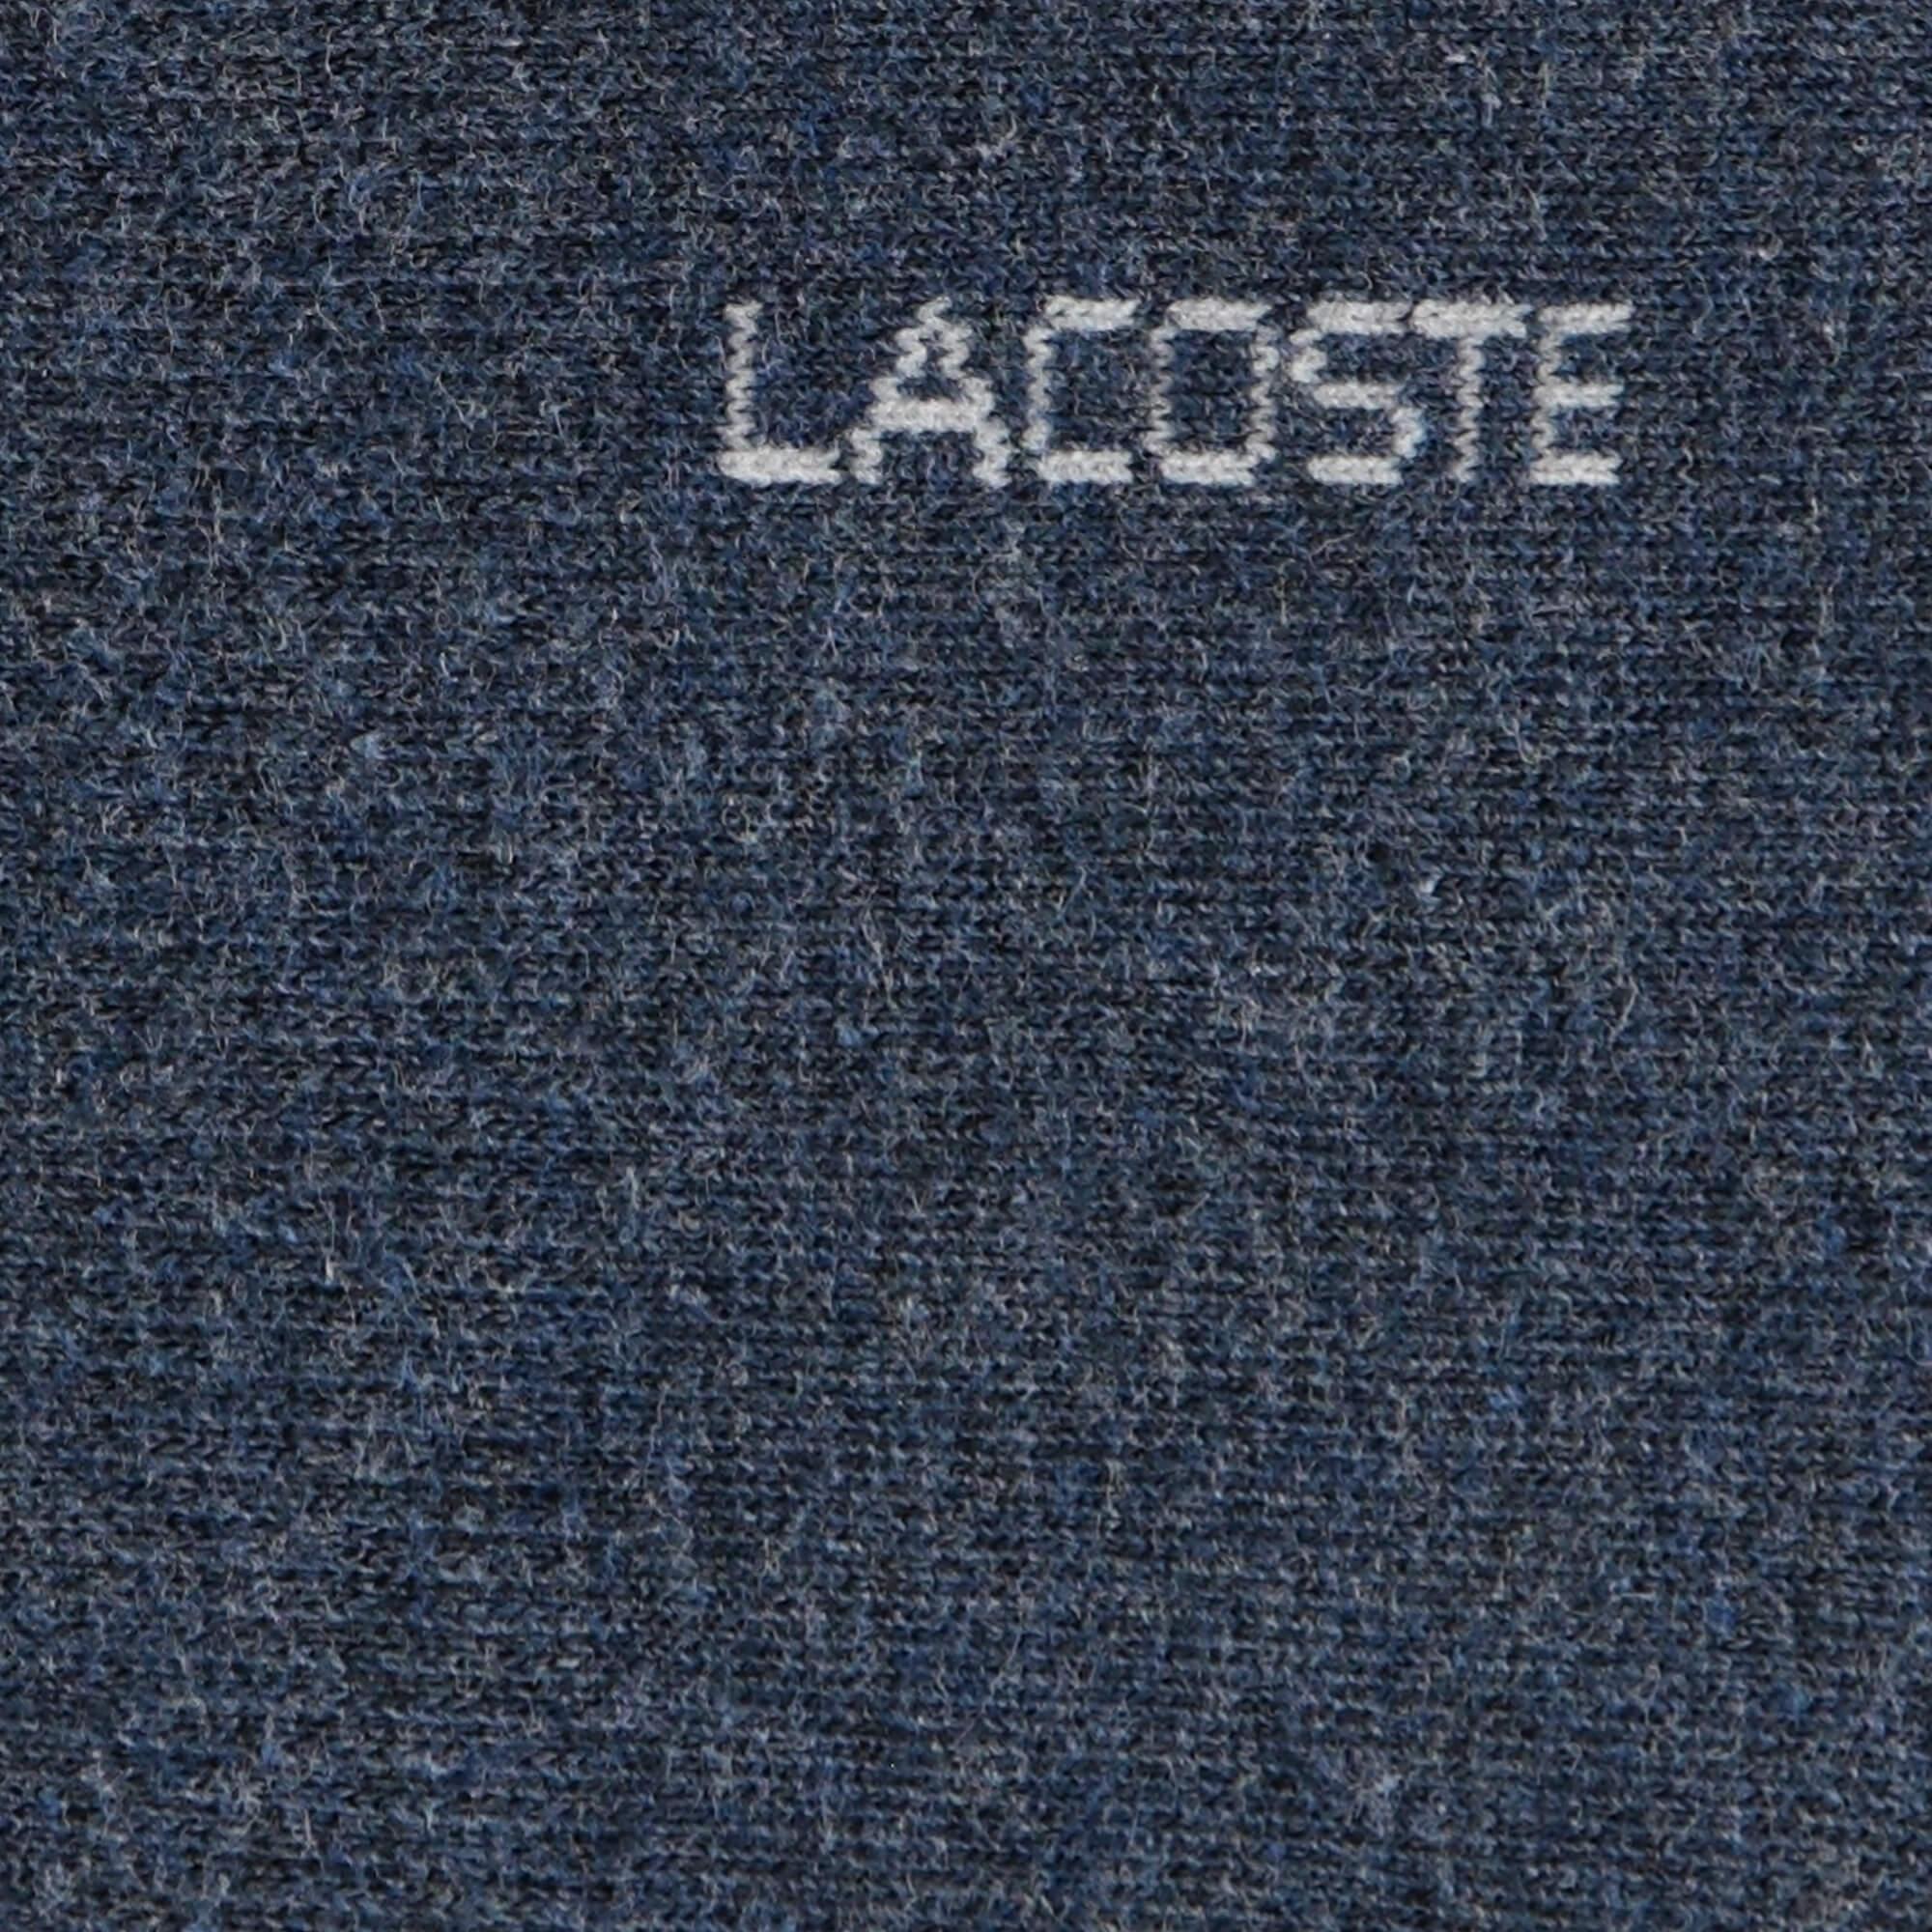 Lacoste Mavi Babet Çorap